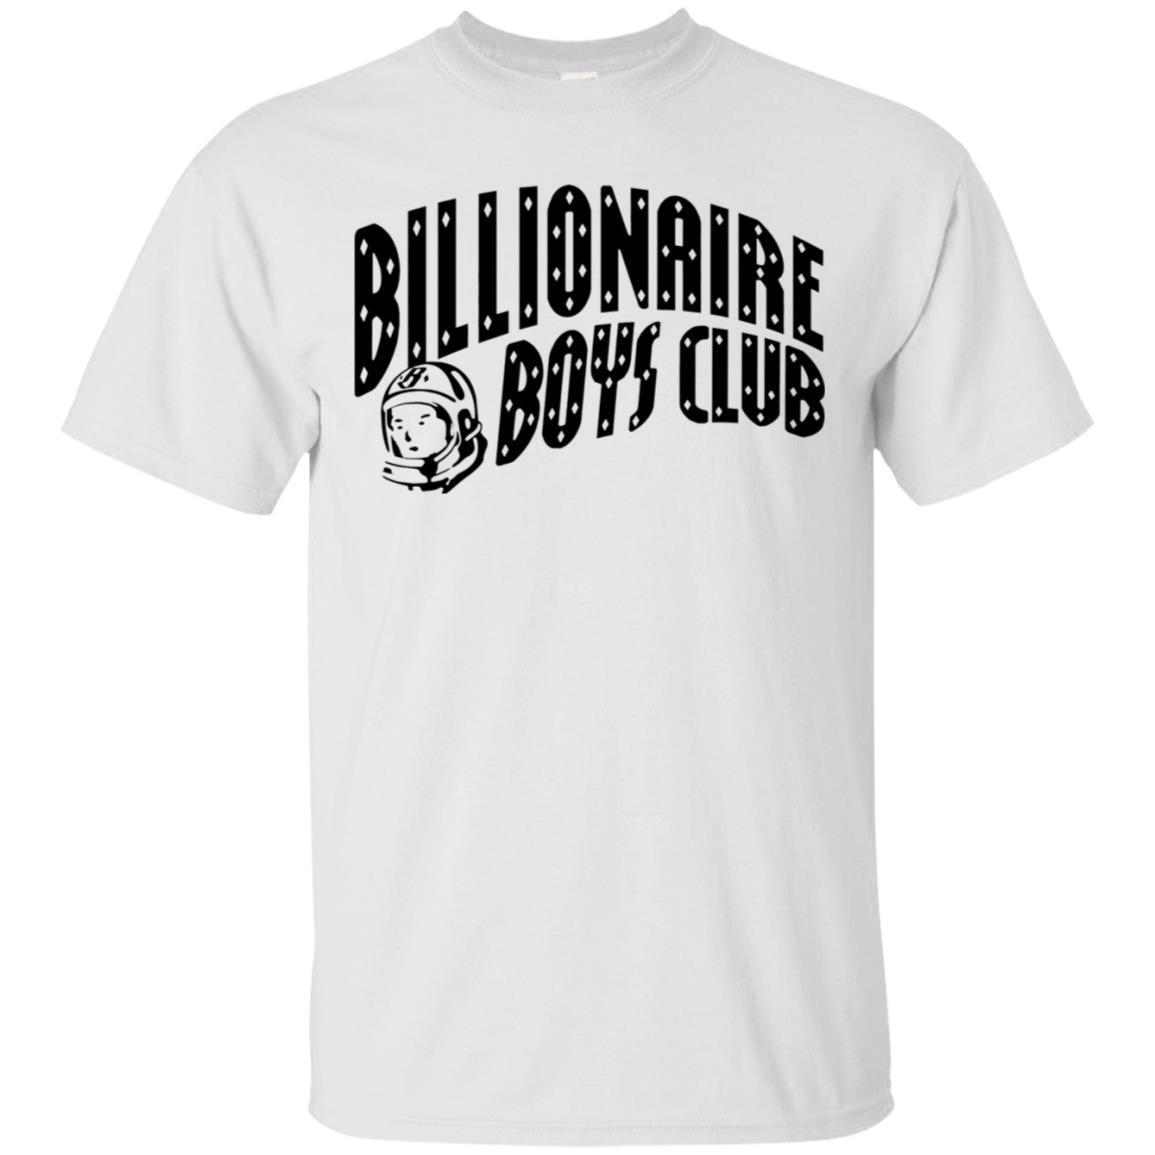 Billionaire Boys Club Logo Printed – Gildan T-Shirt